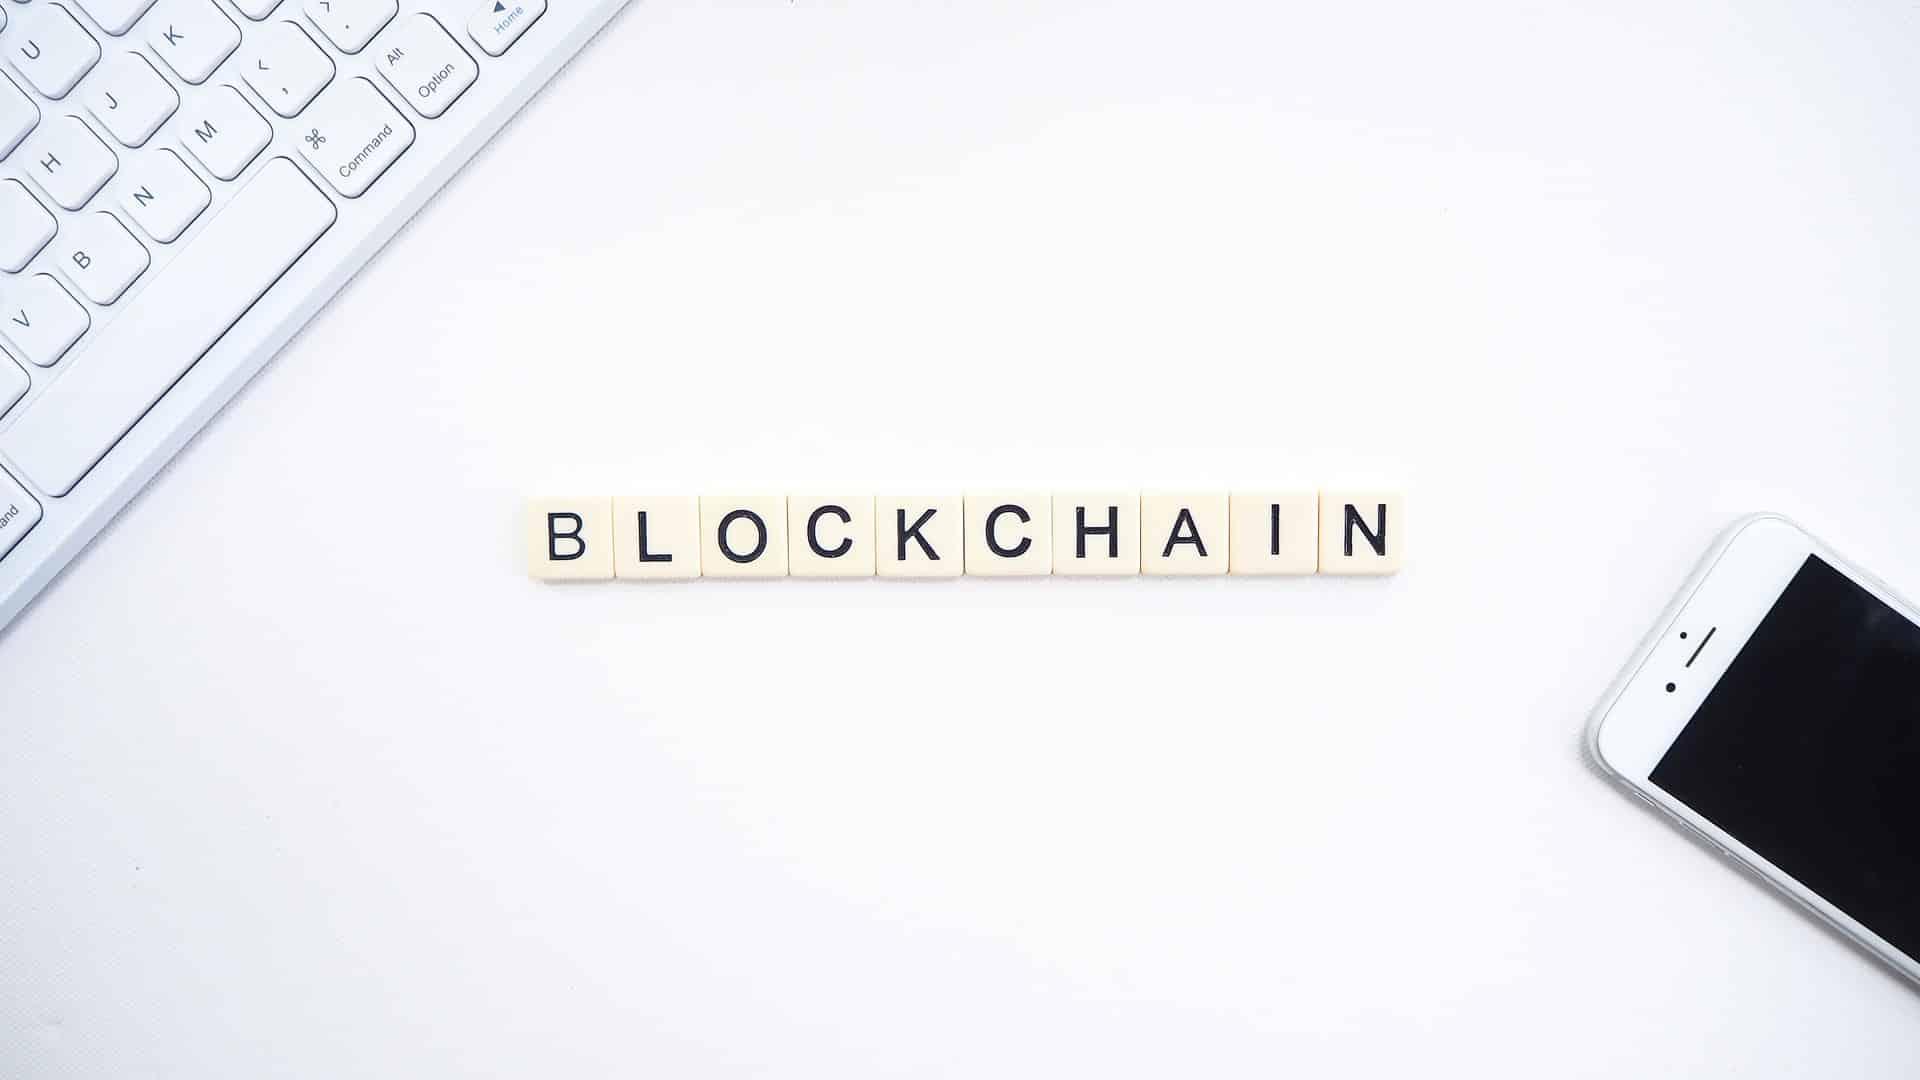 Blockchain Future Online Gambling Header Image